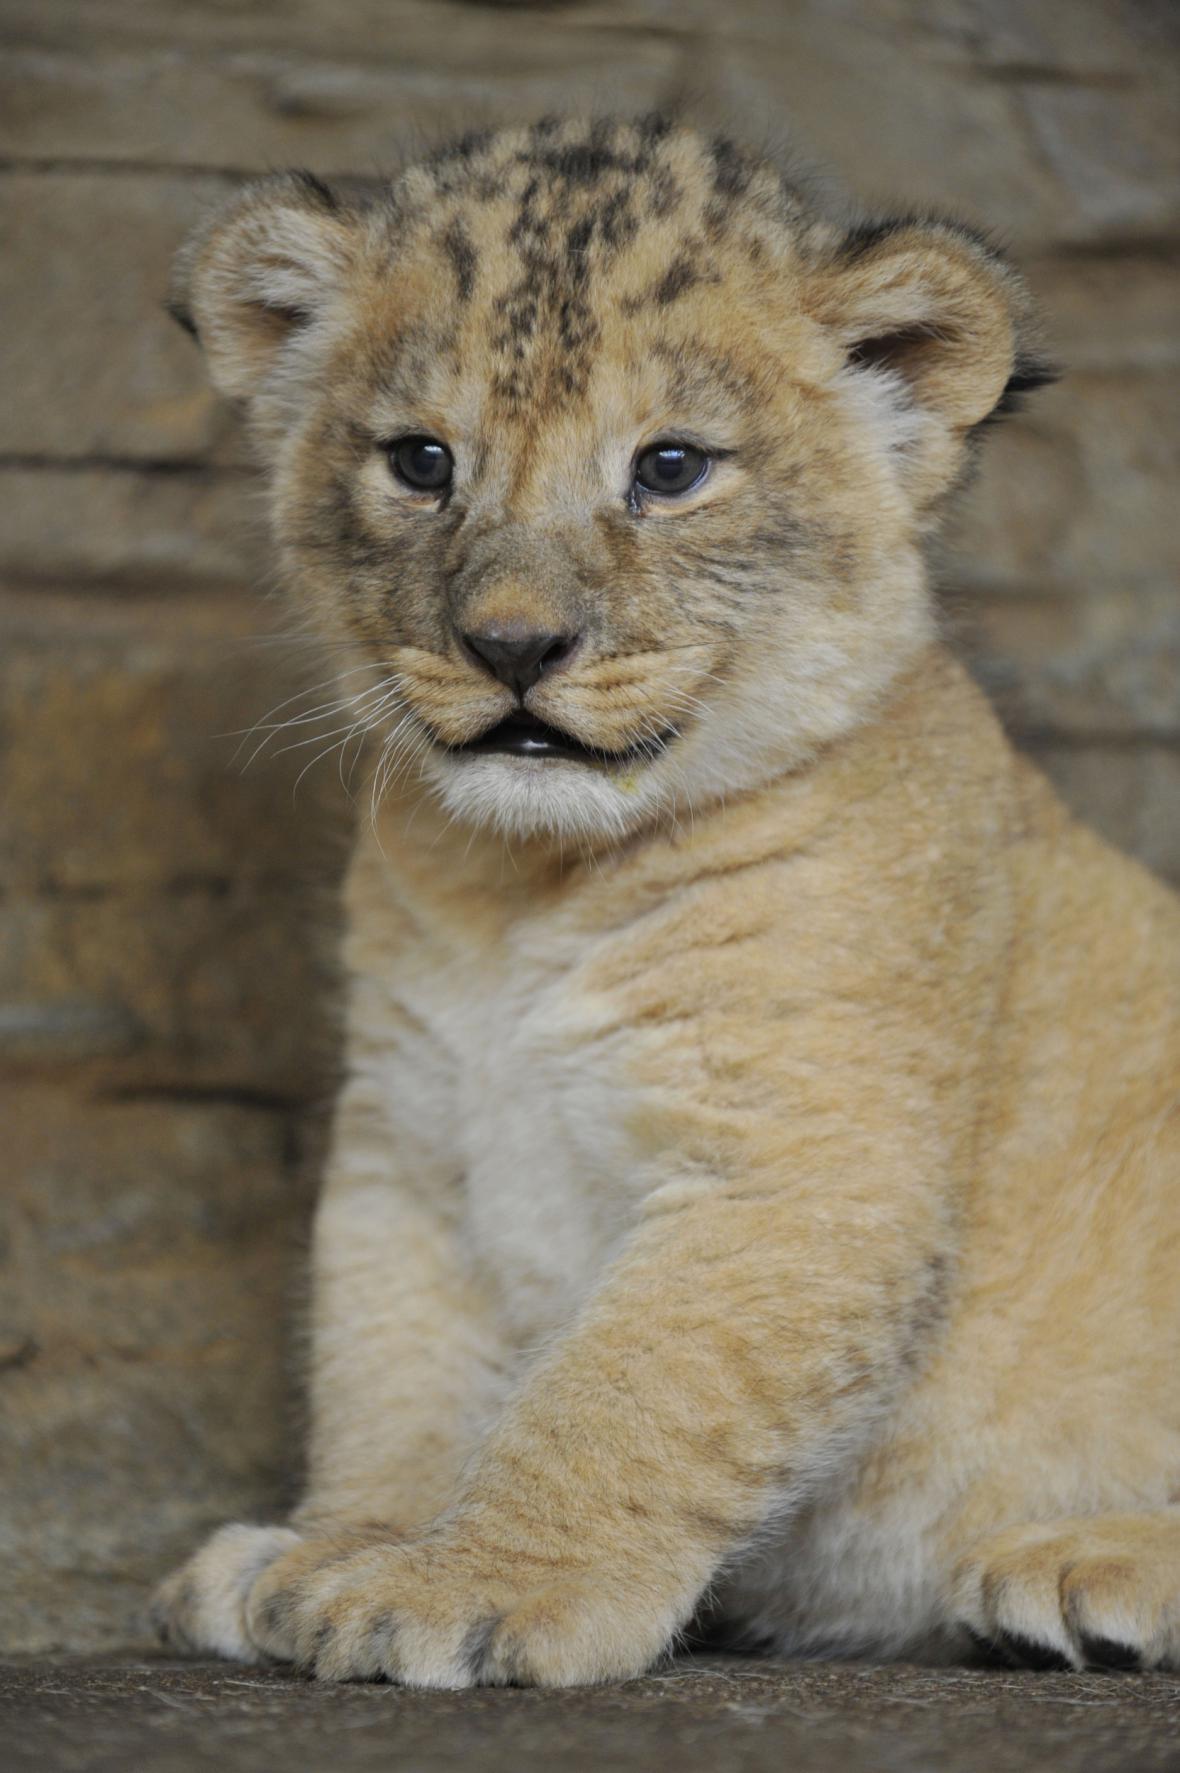 Mládě lva berberského